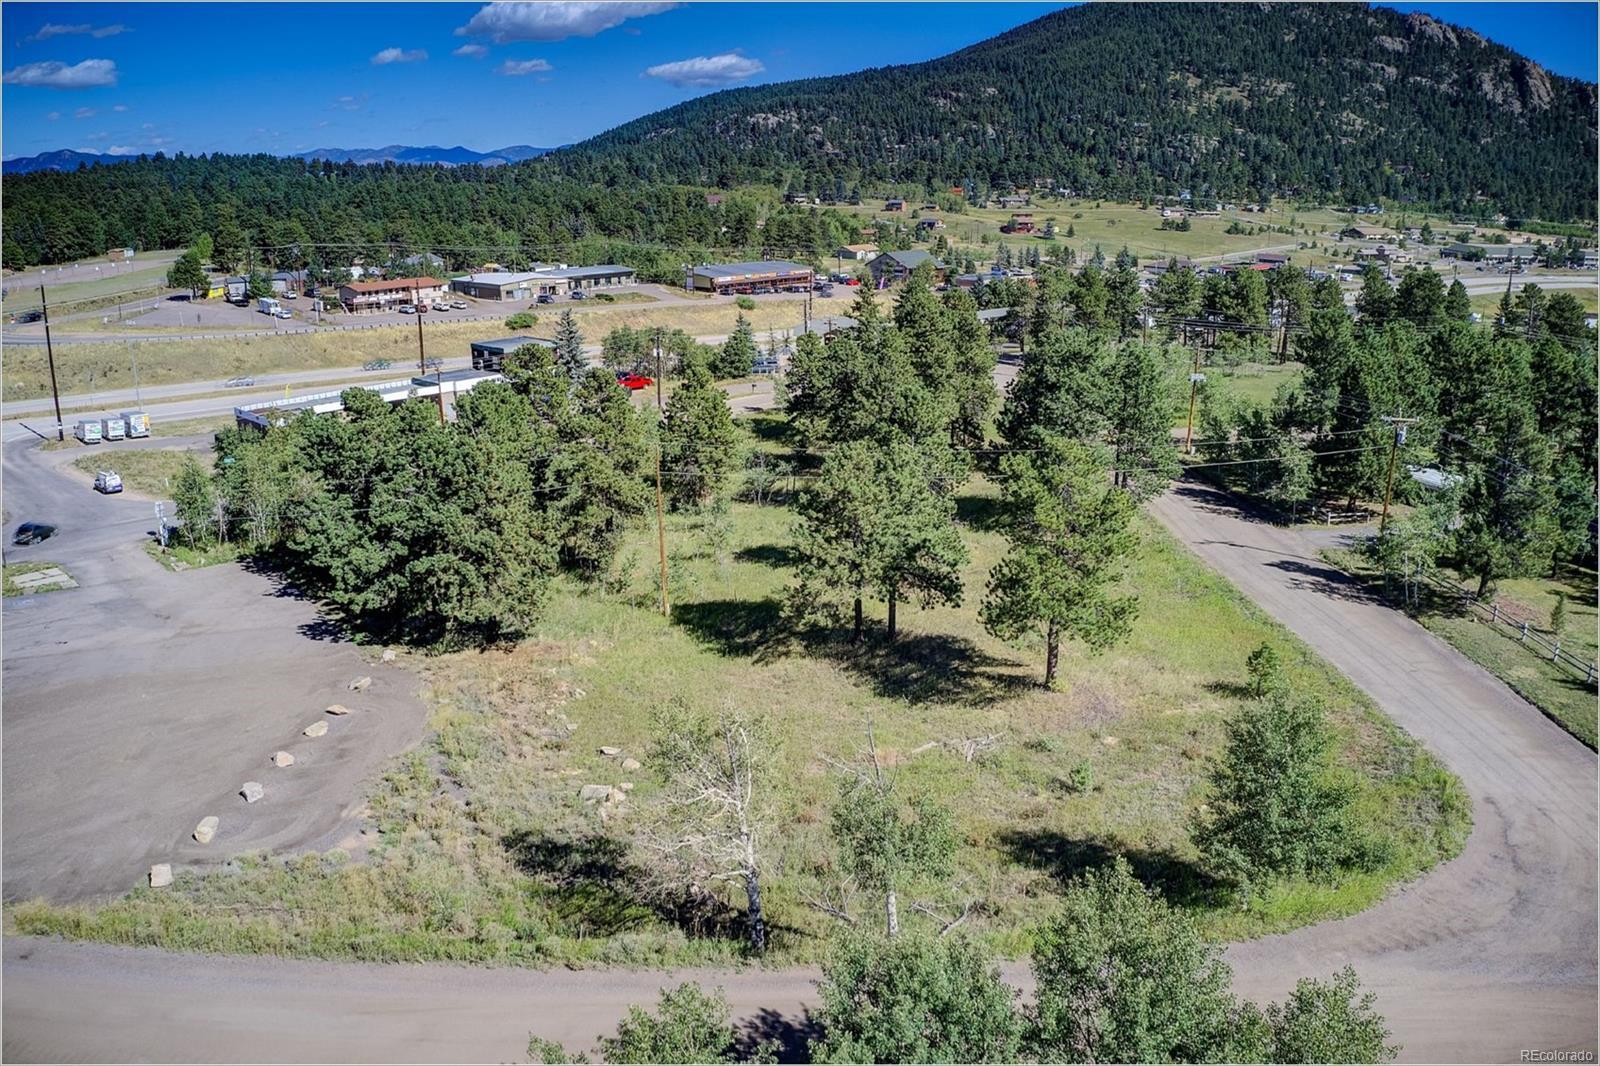 0 Main Street, Conifer, CO 80433 - Conifer, CO real estate listing